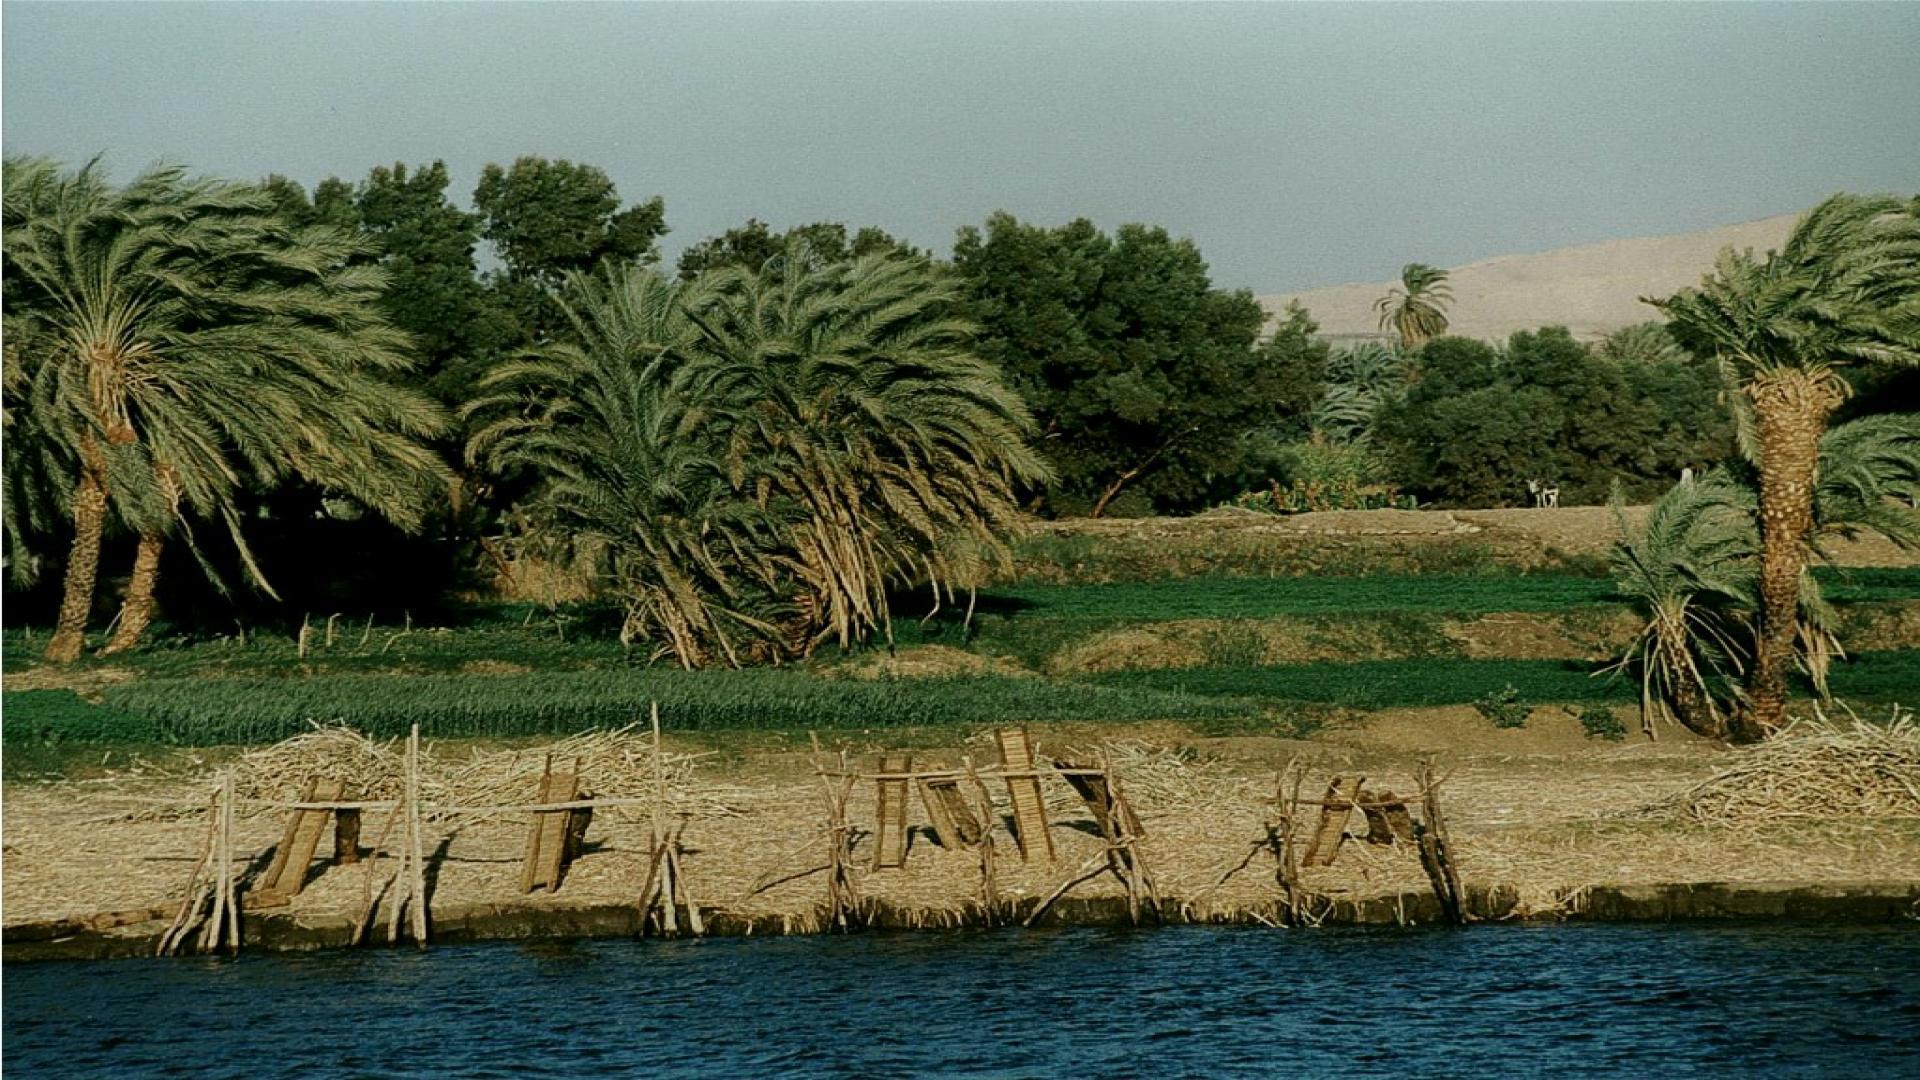 Download HD Download Egypt Landscape Pic 1920x1080 - Kostenlos ...